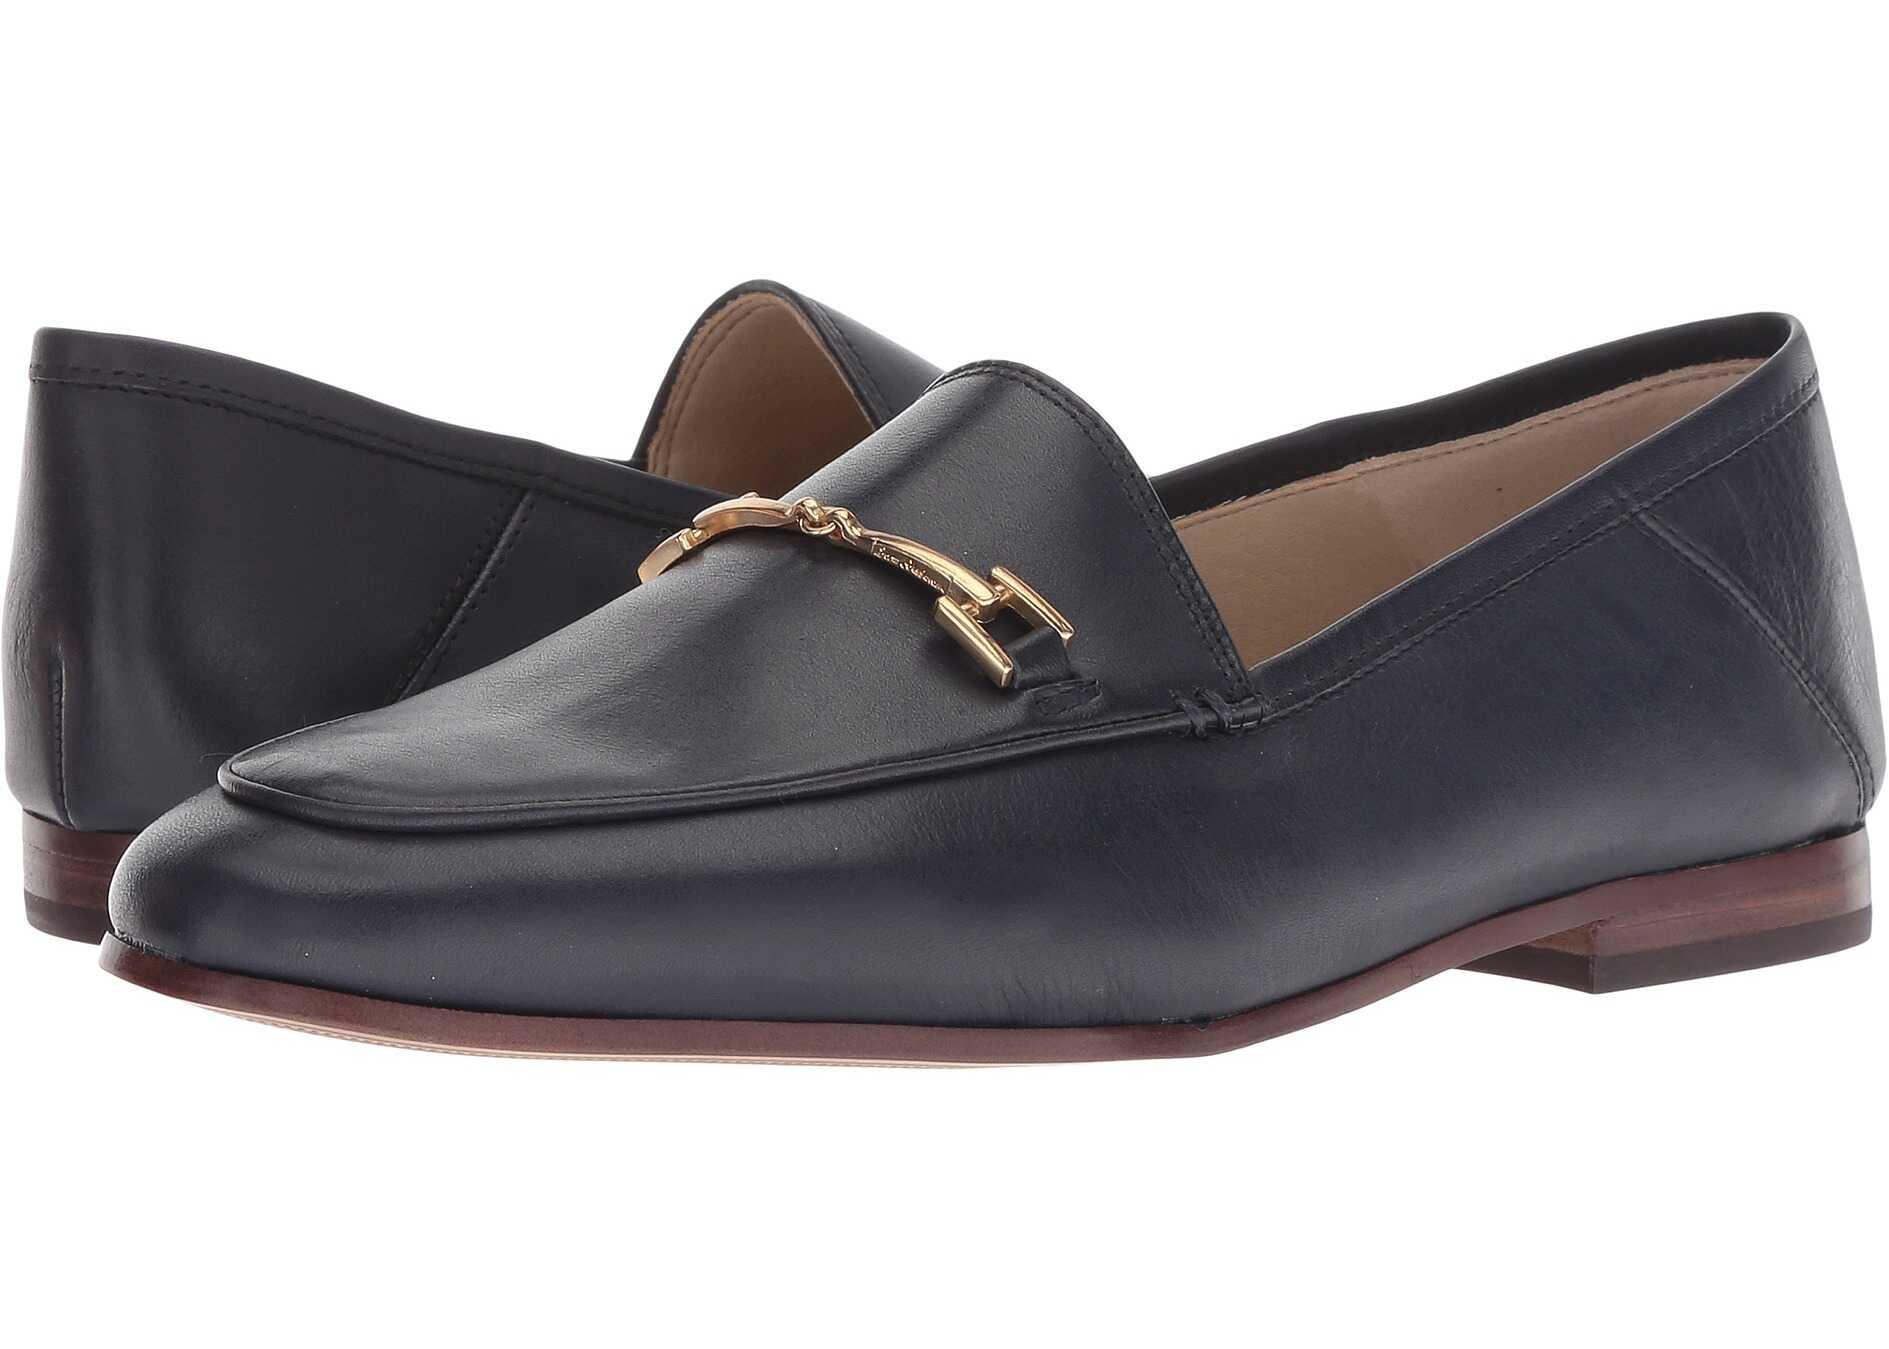 Sam Edelman Loraine Baltic Navy Modena Calf Leather